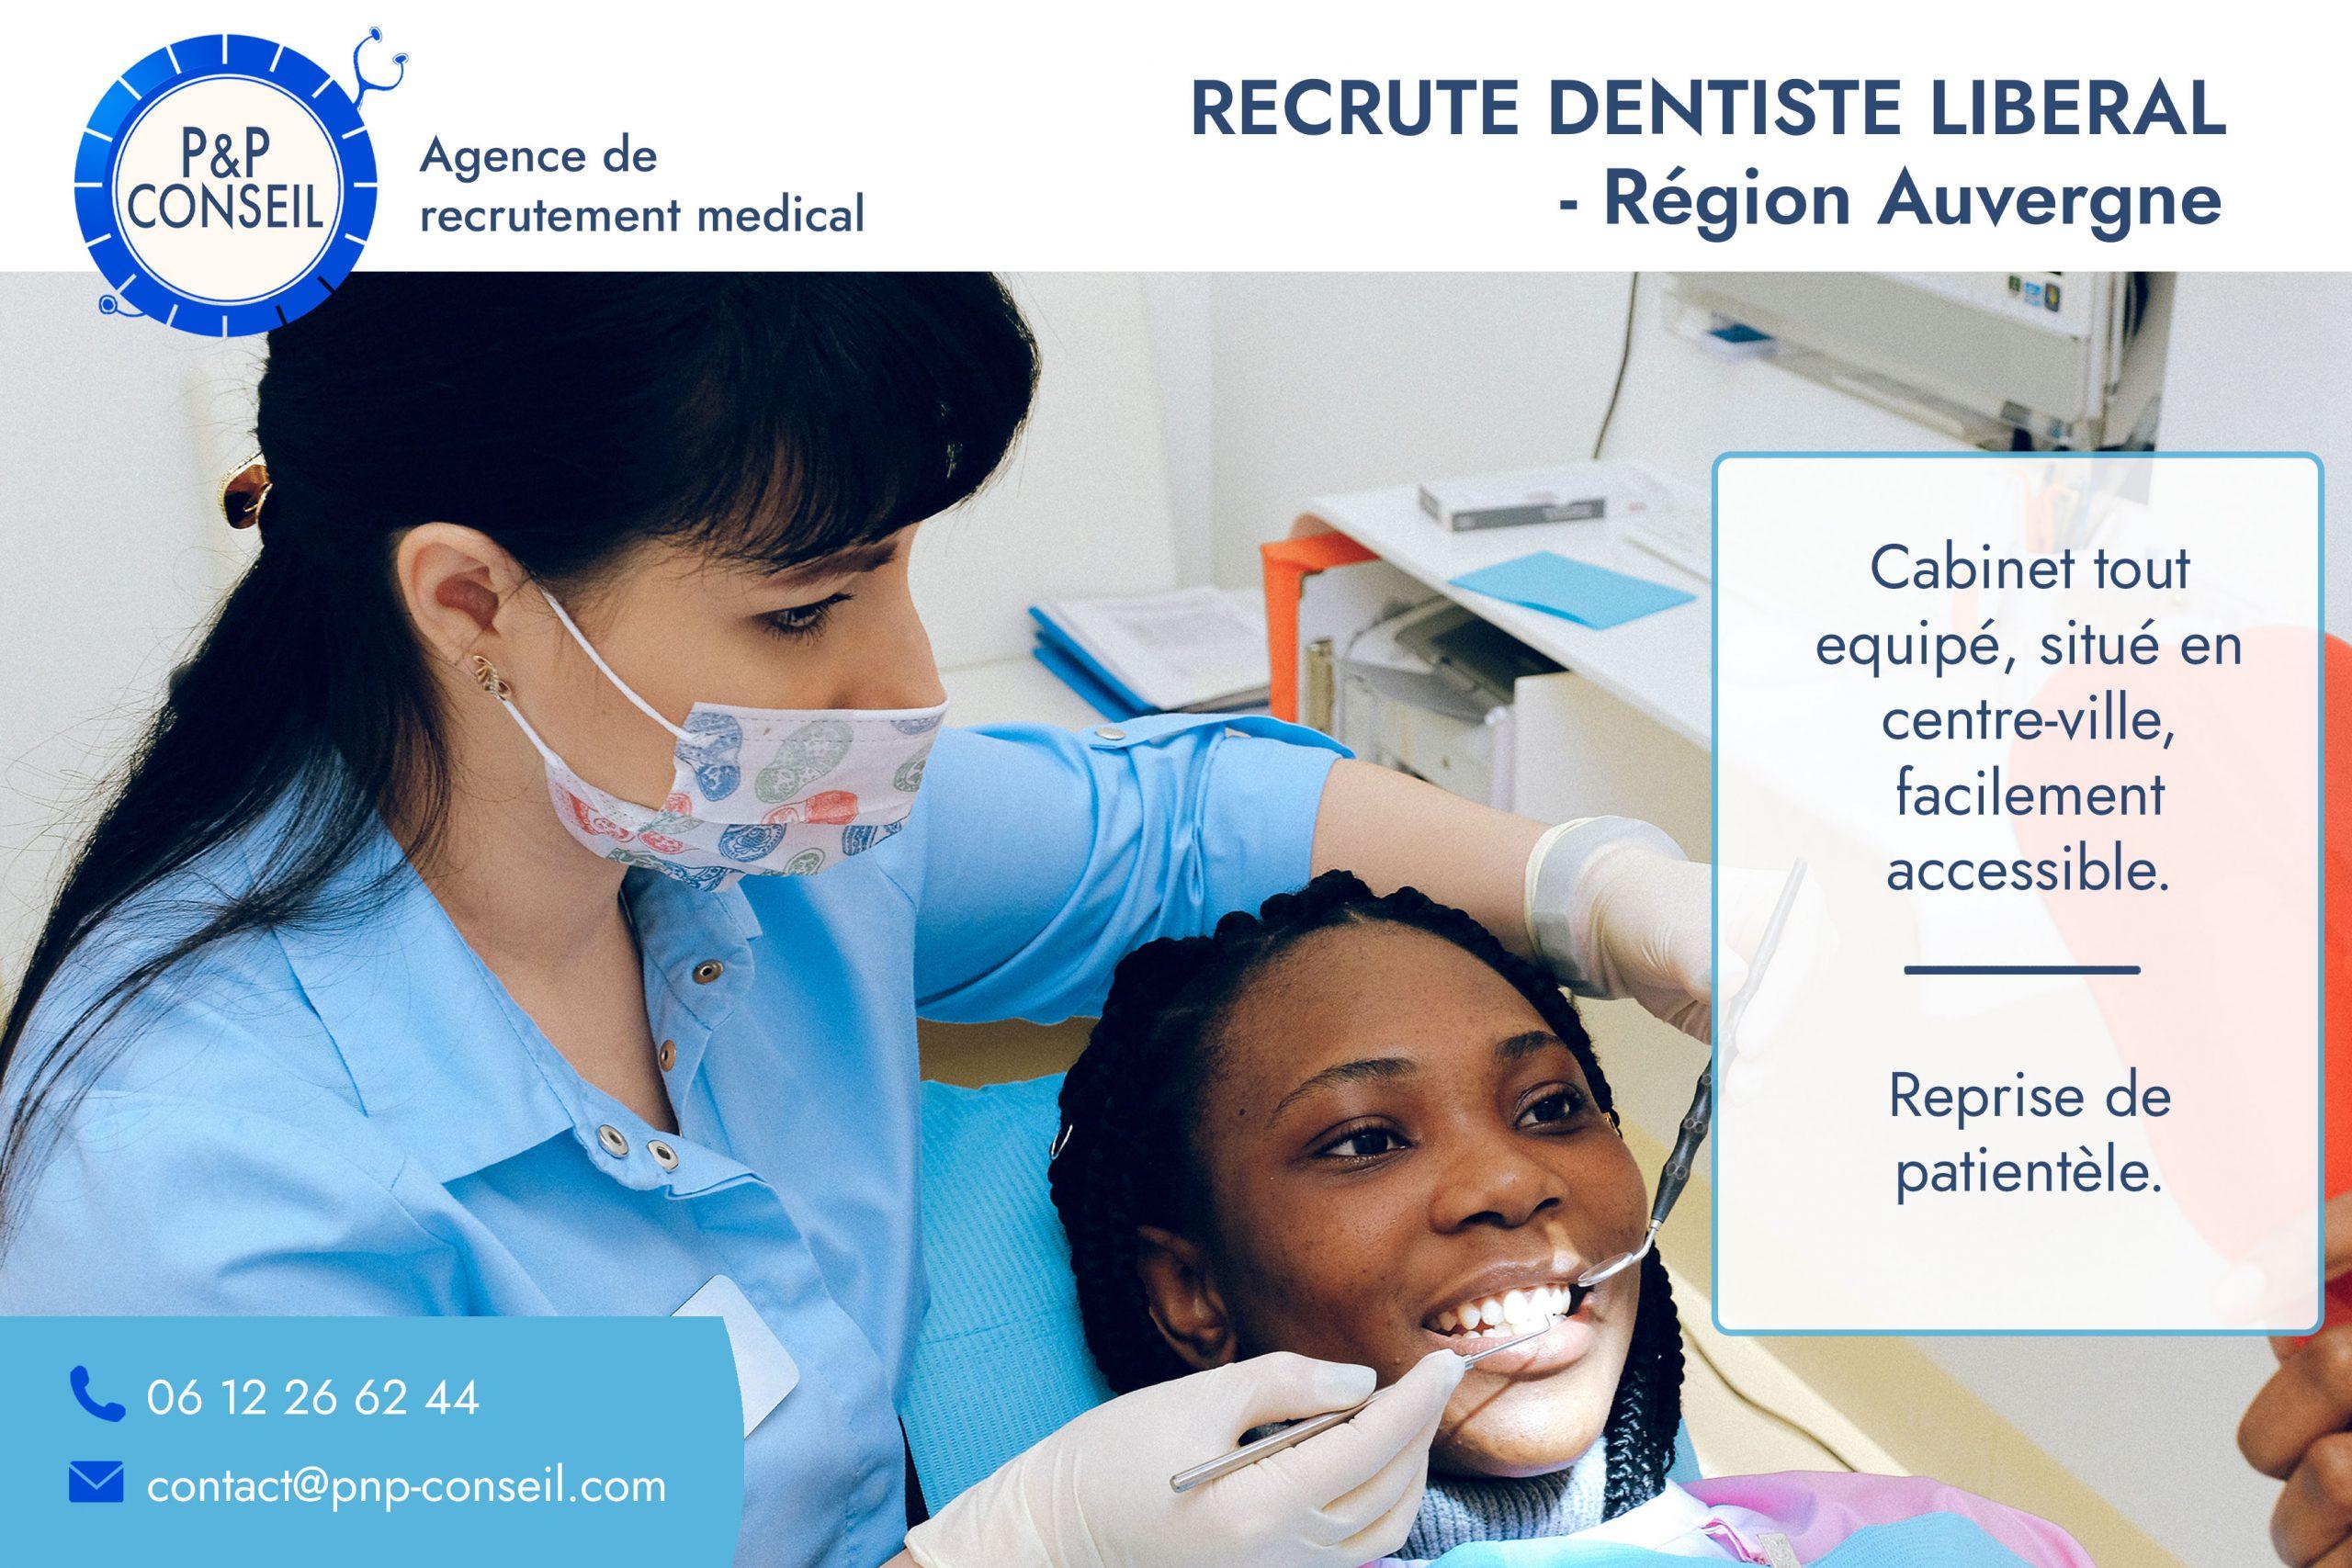 dentiste-liberal-auvergne